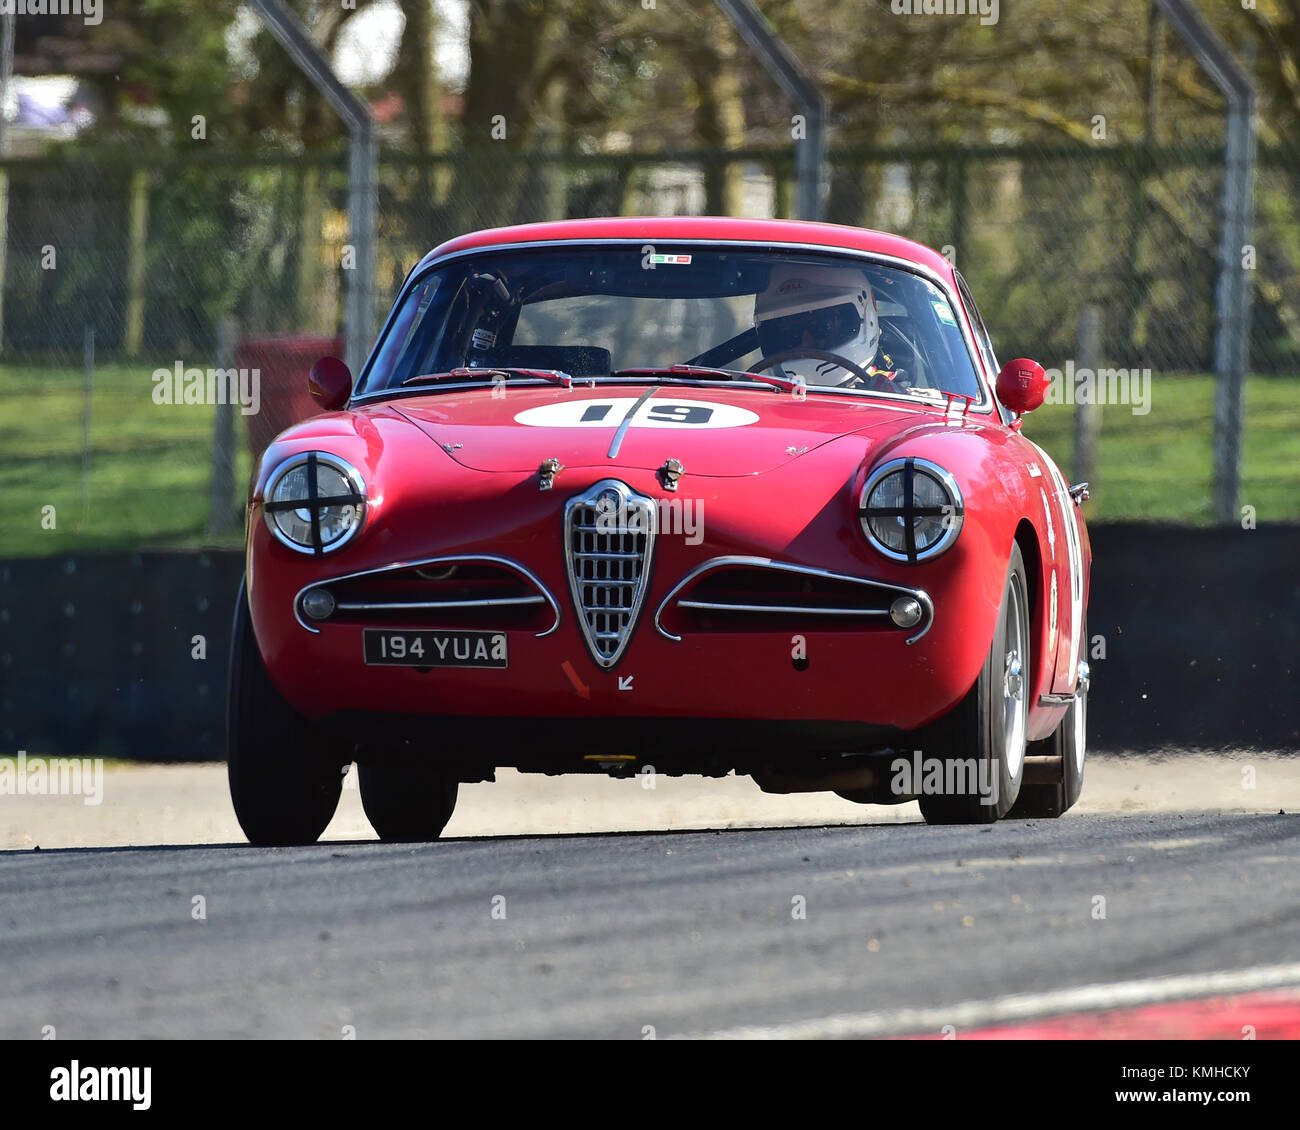 Alfa Romeo 1900 Stock Photos & Alfa Romeo 1900 Stock